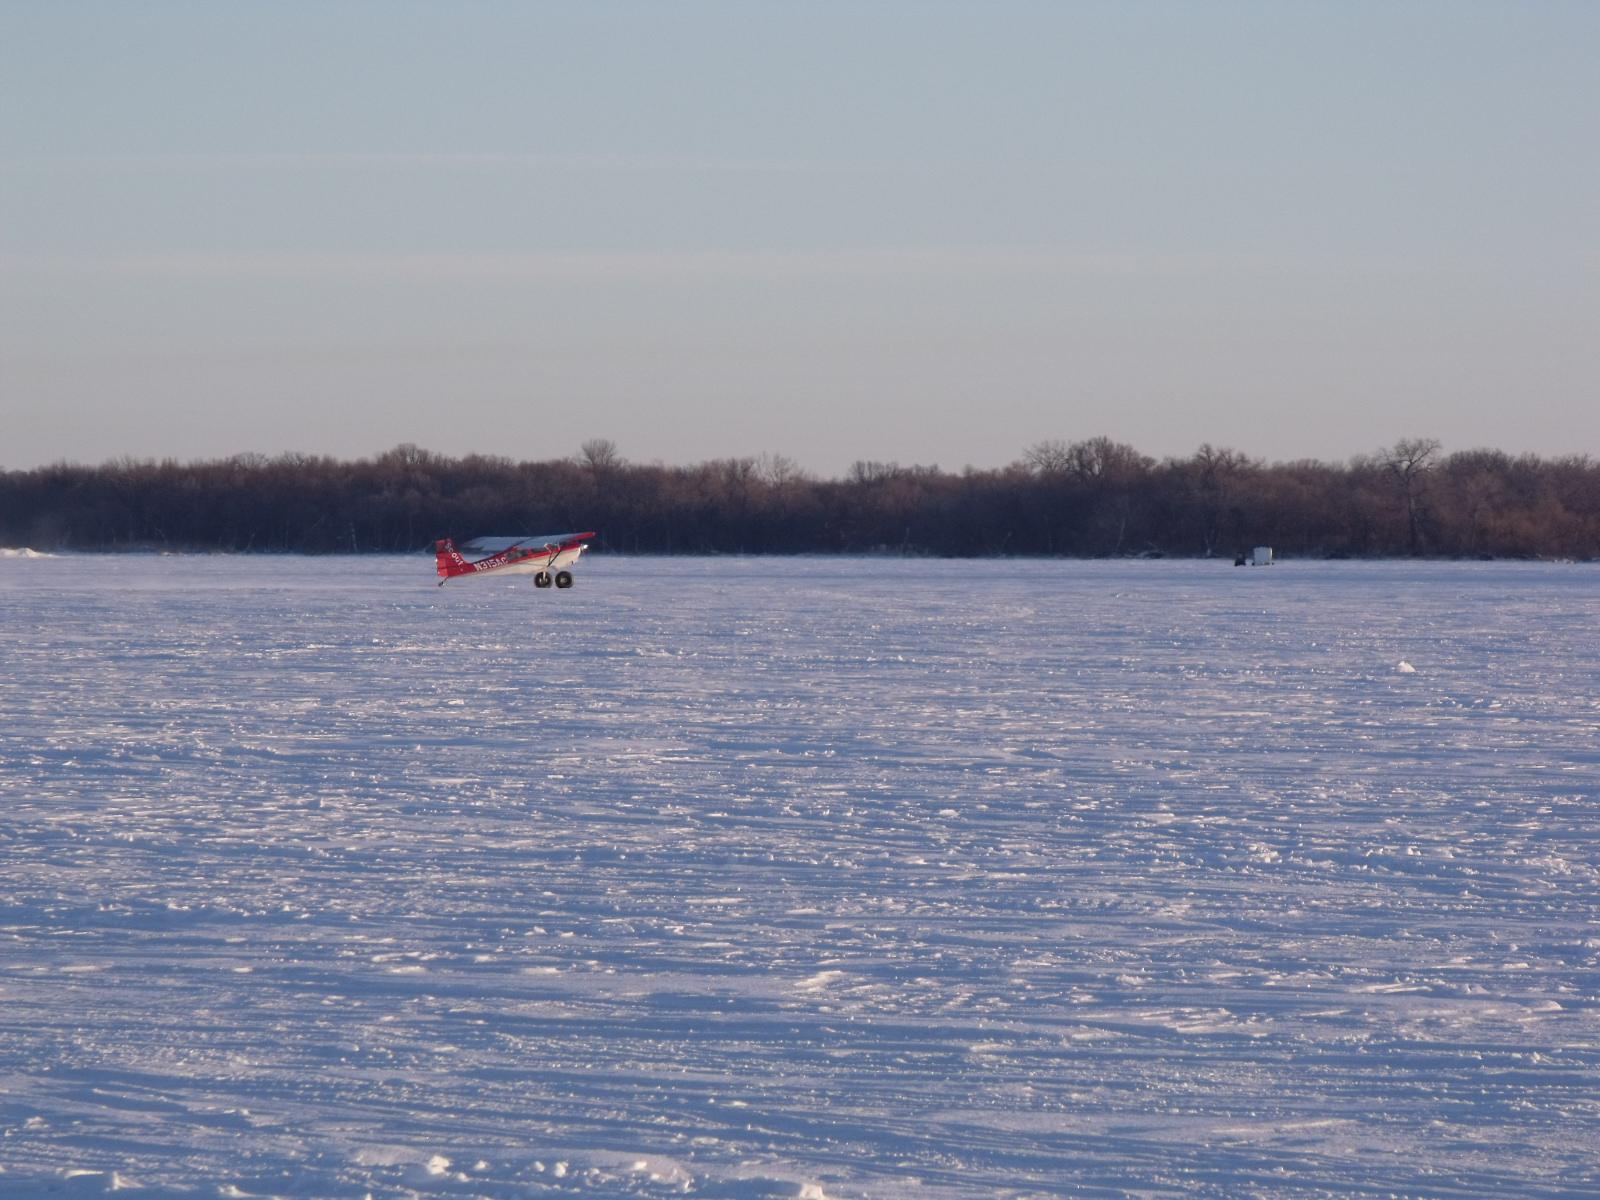 Ice fishing a minnesota tradition callens honey farm for Fishing in minnesota